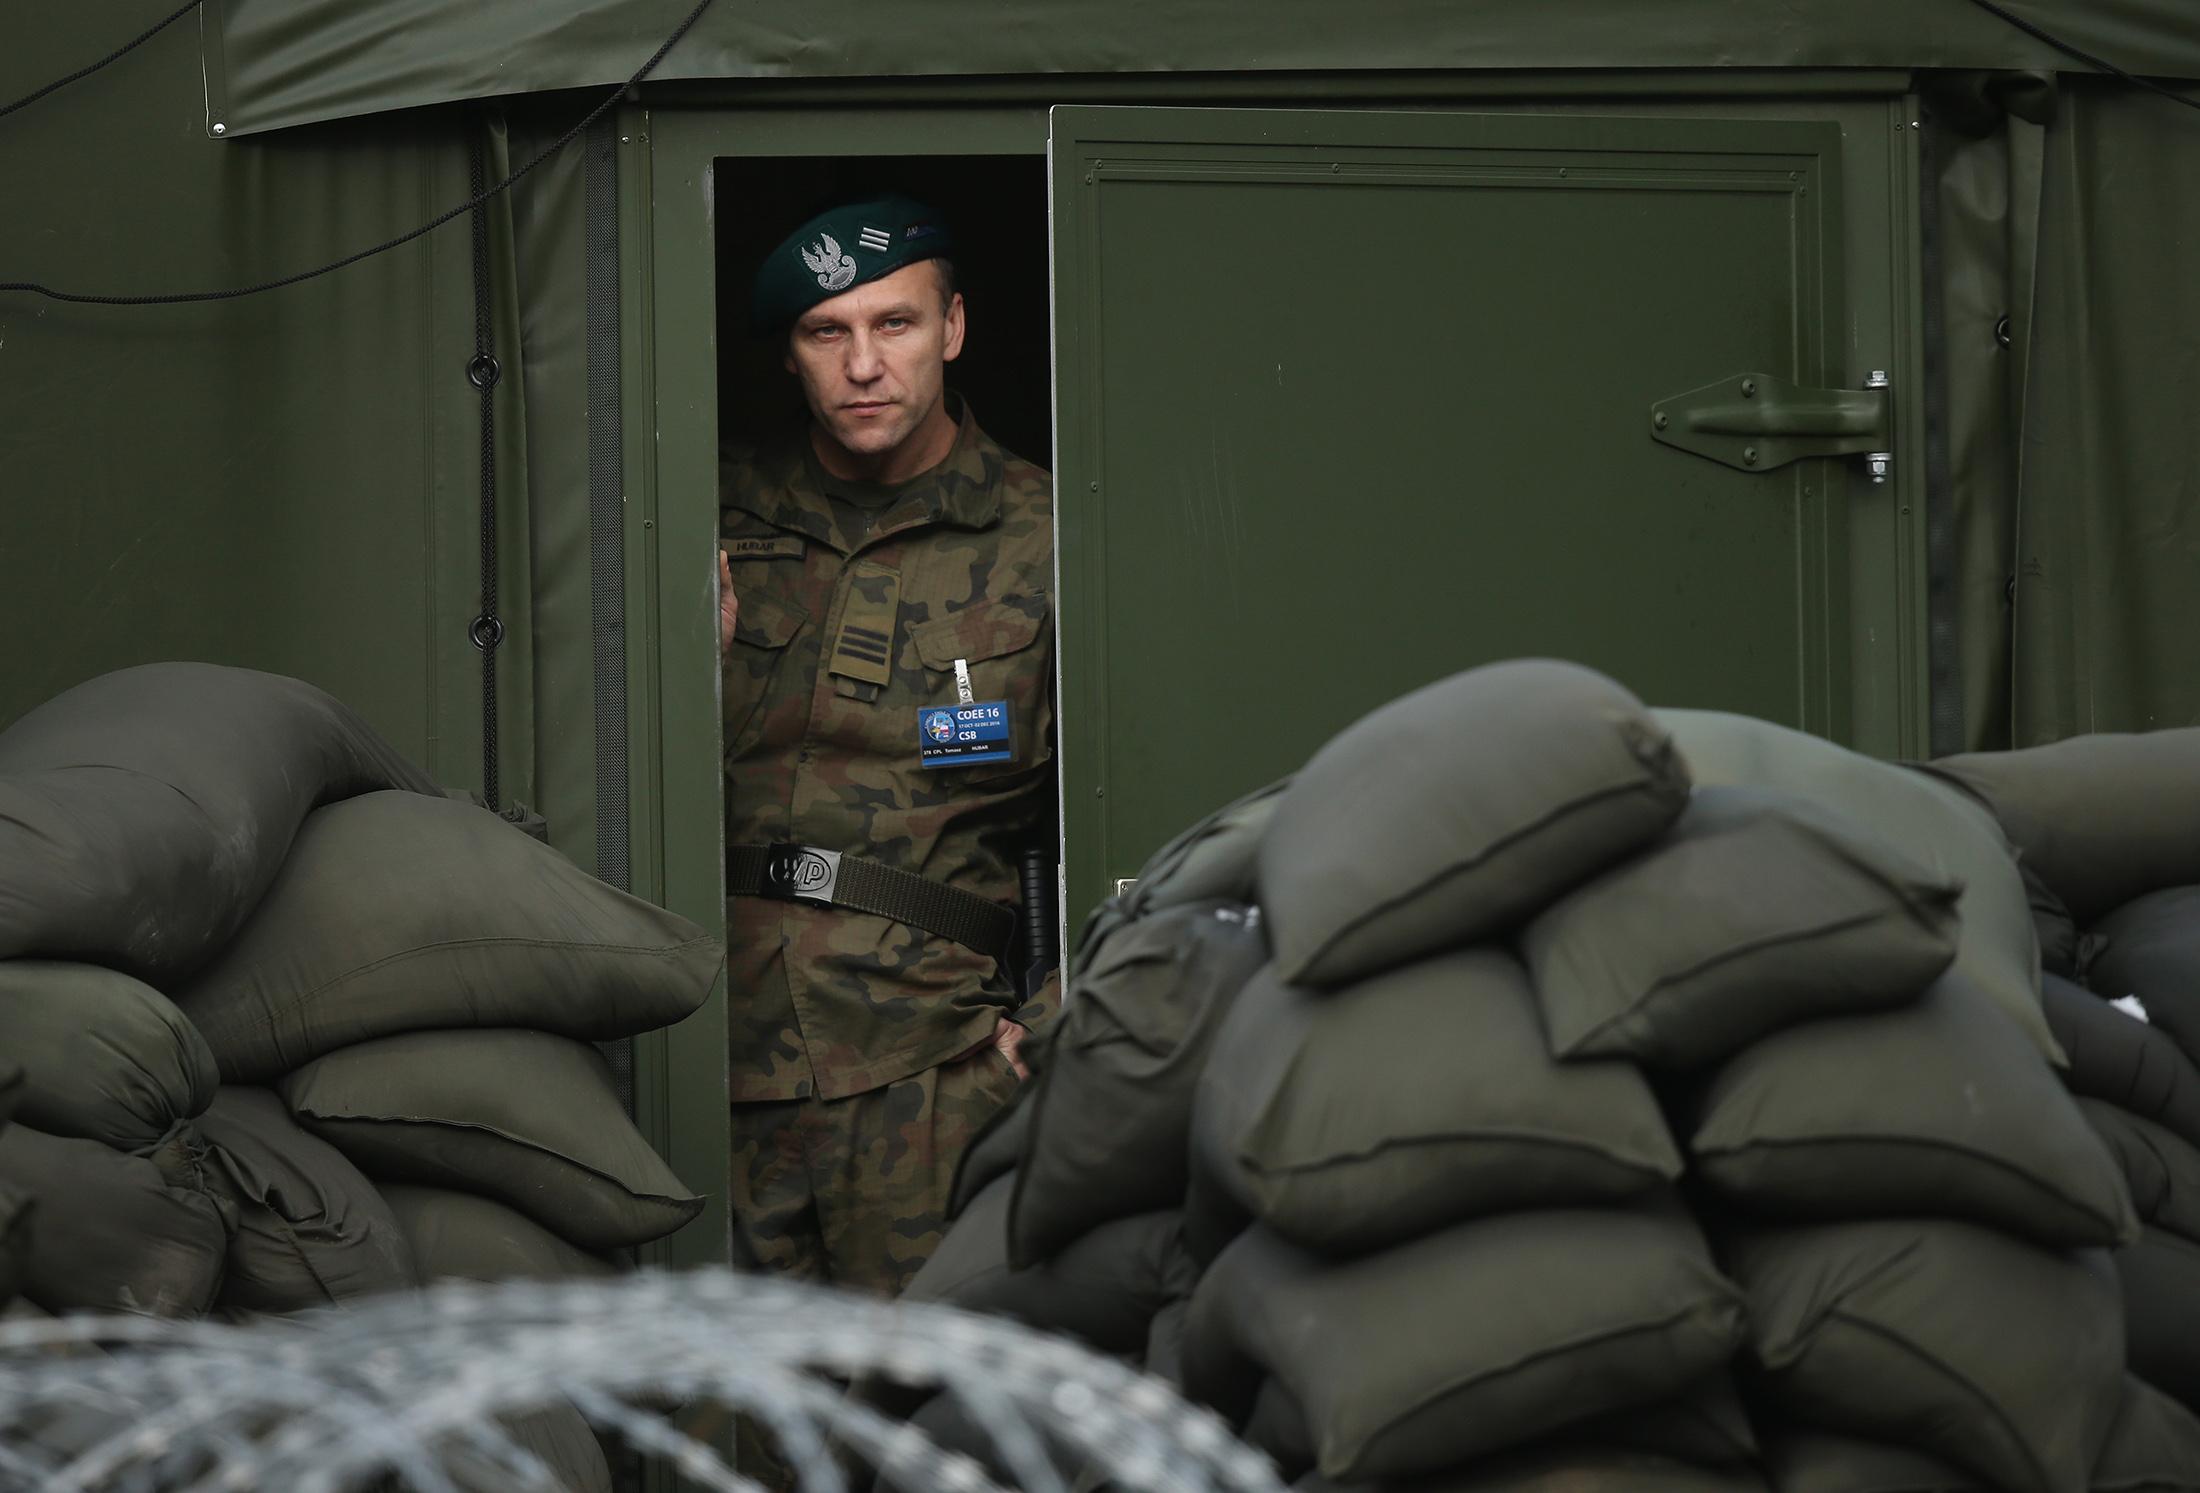 Trump Slams NATO, Floats Russia Nuke Deal in European Interview